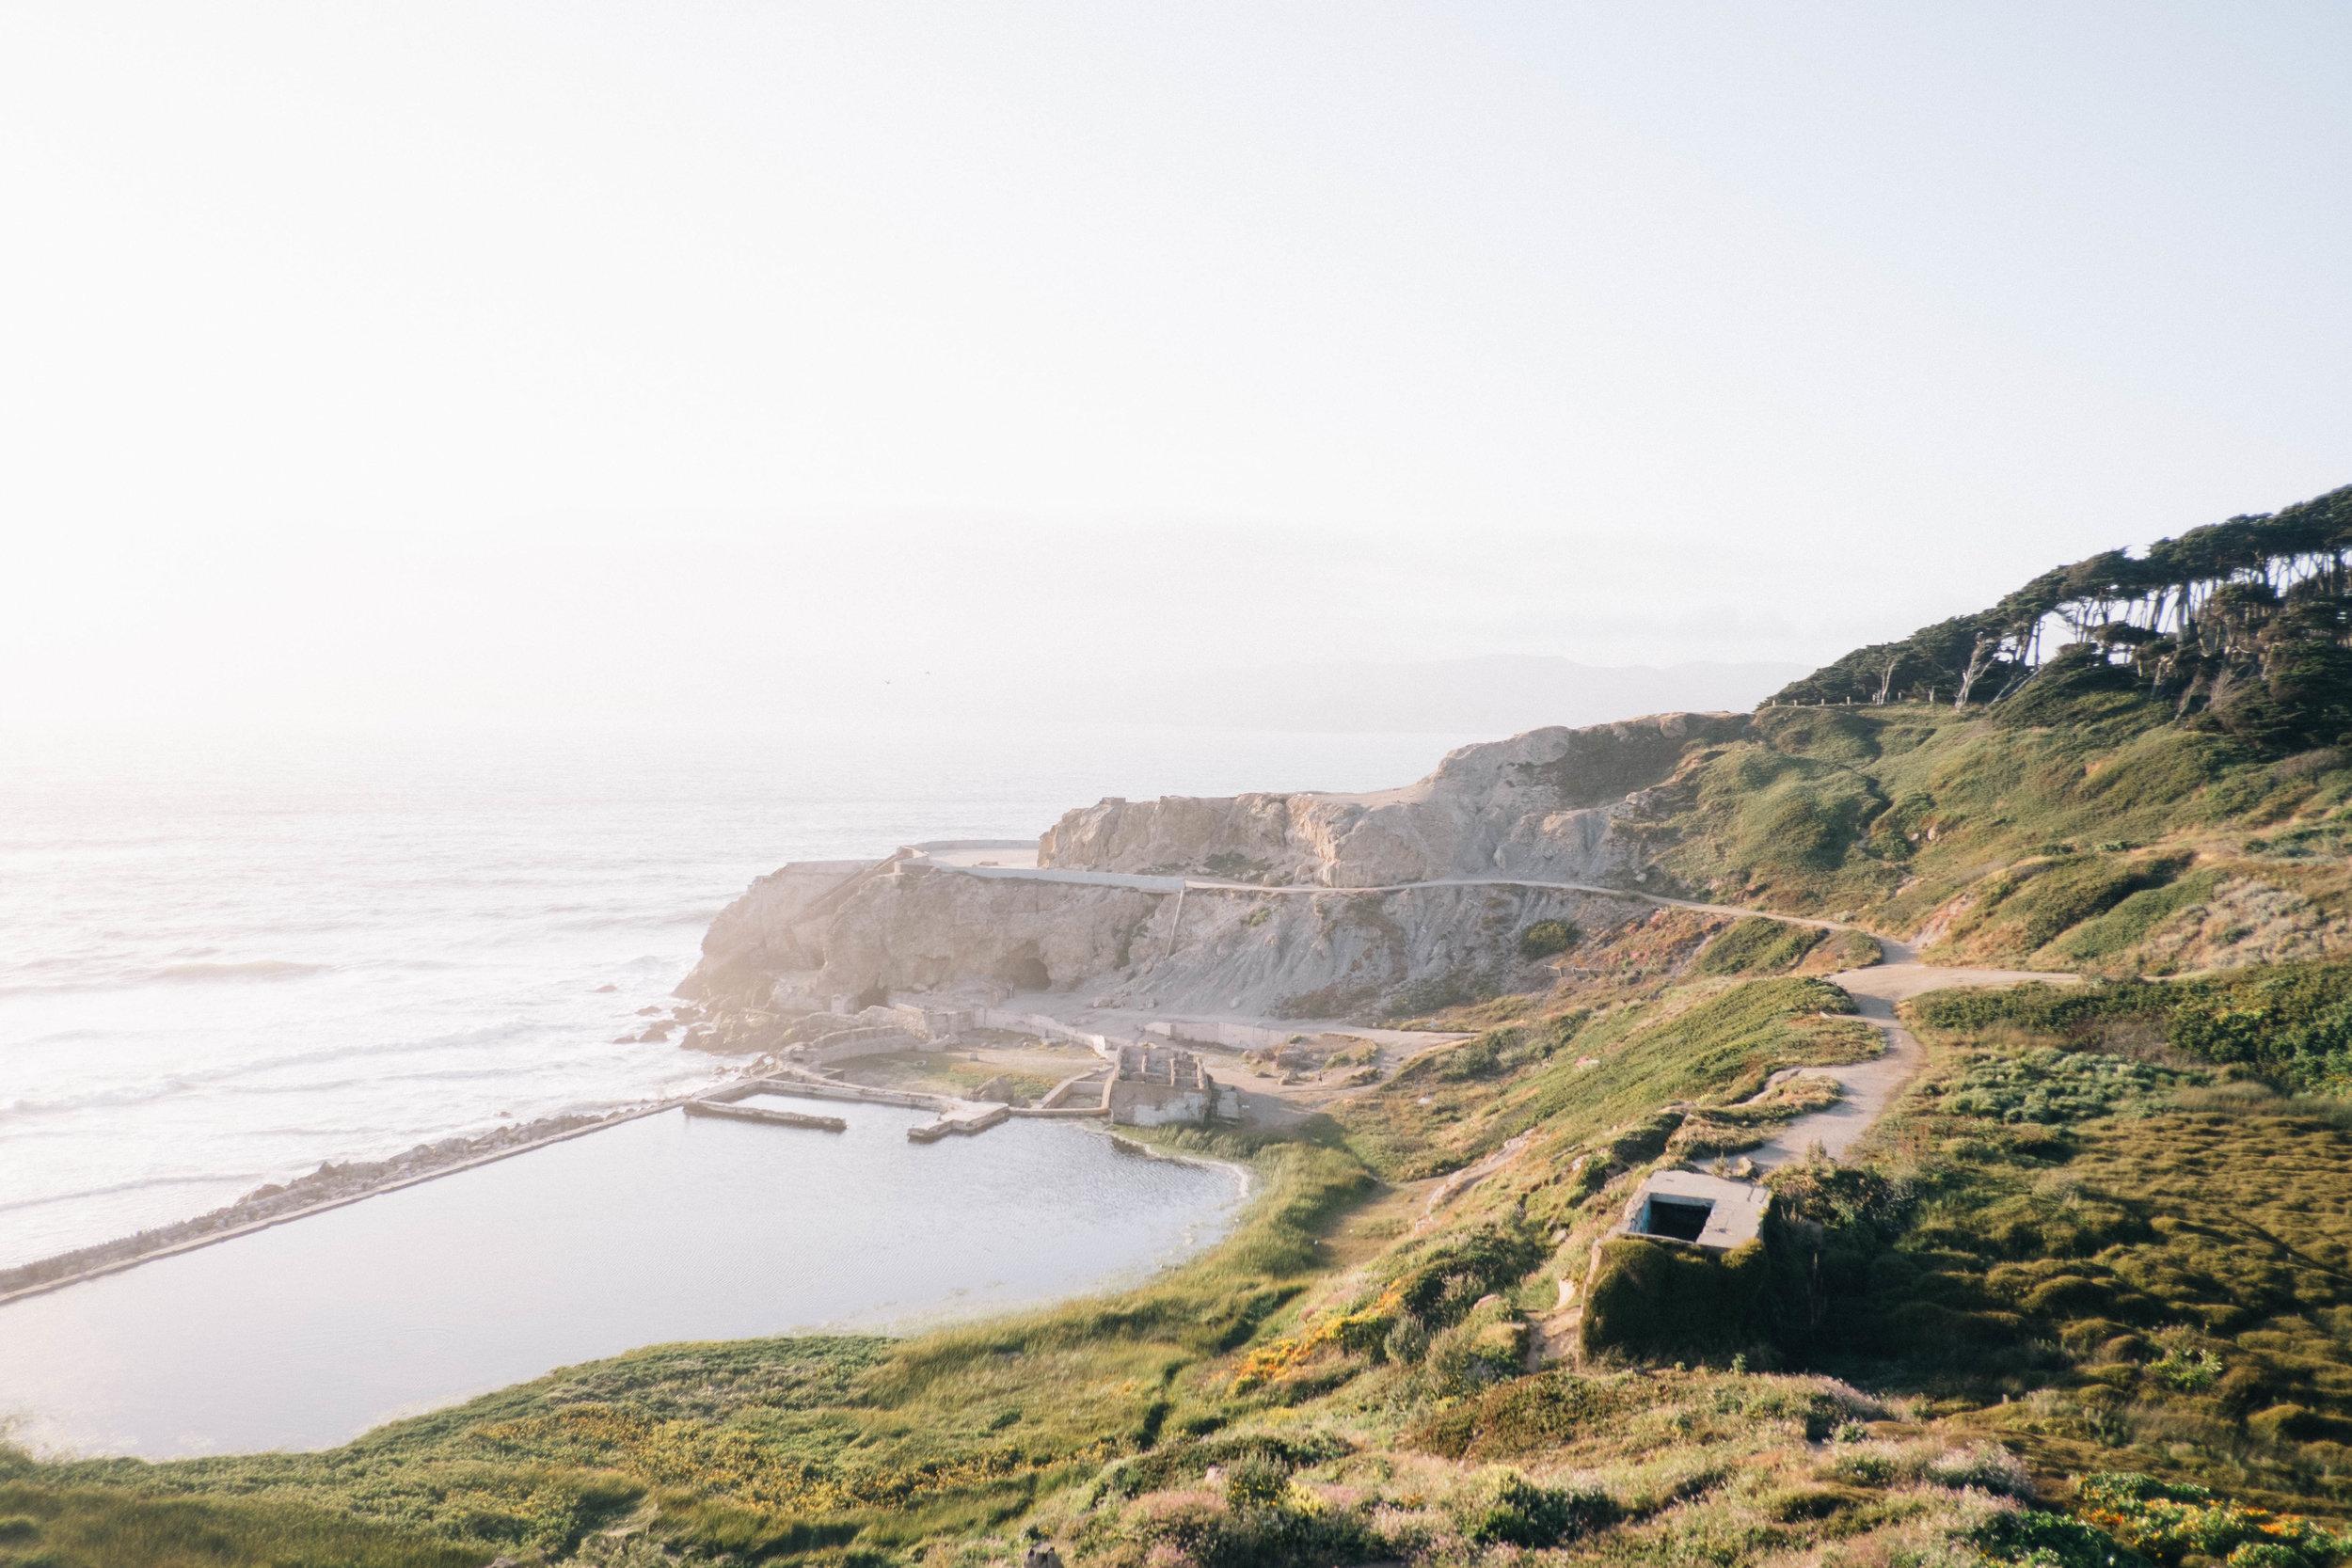 San_Francisco4.jpg